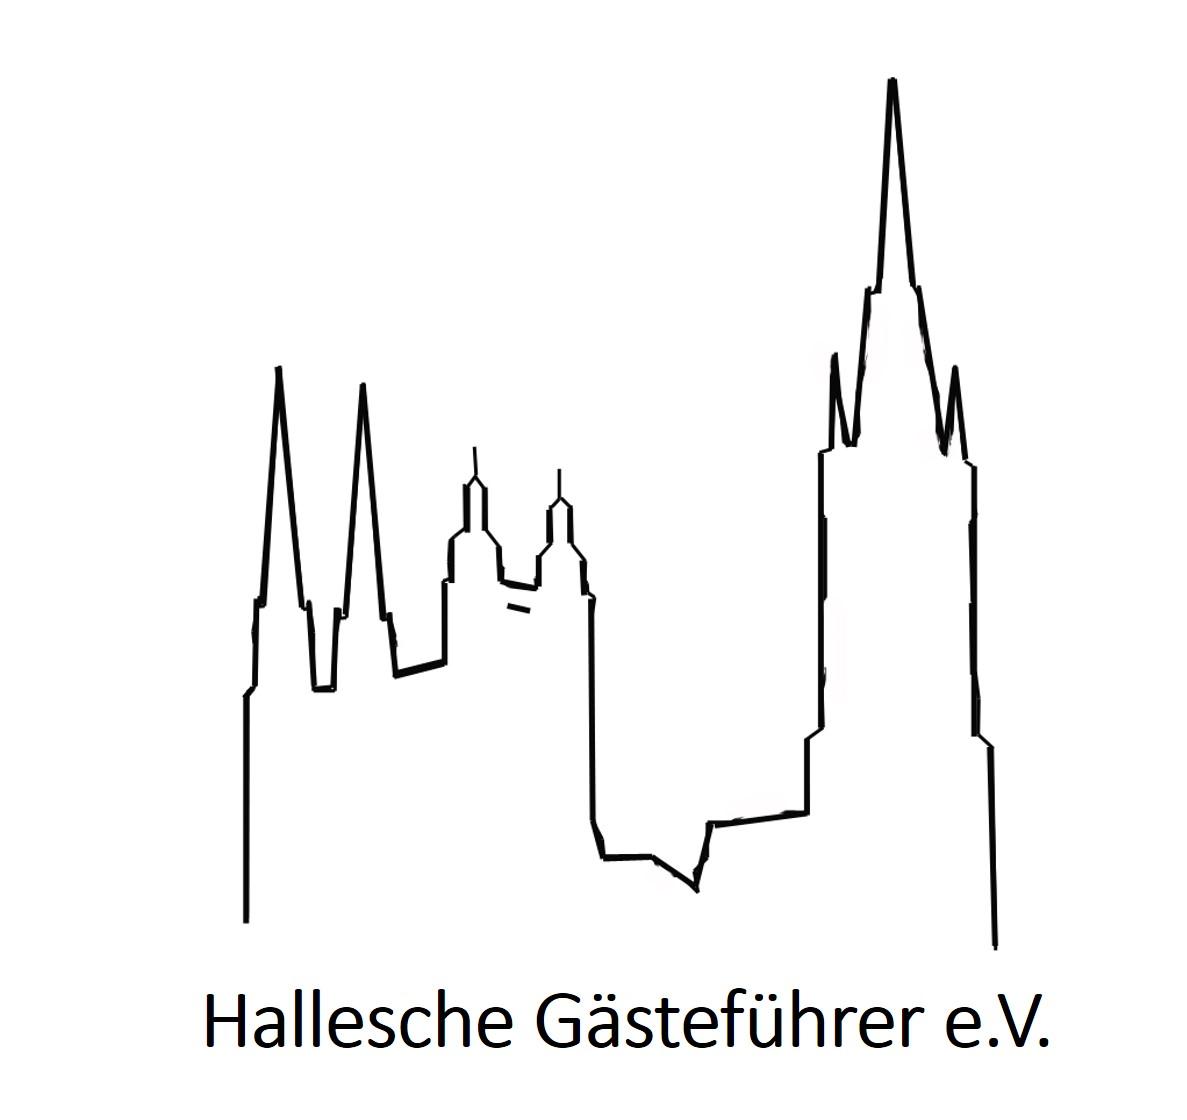 Hallescher Gästeführer e.V.